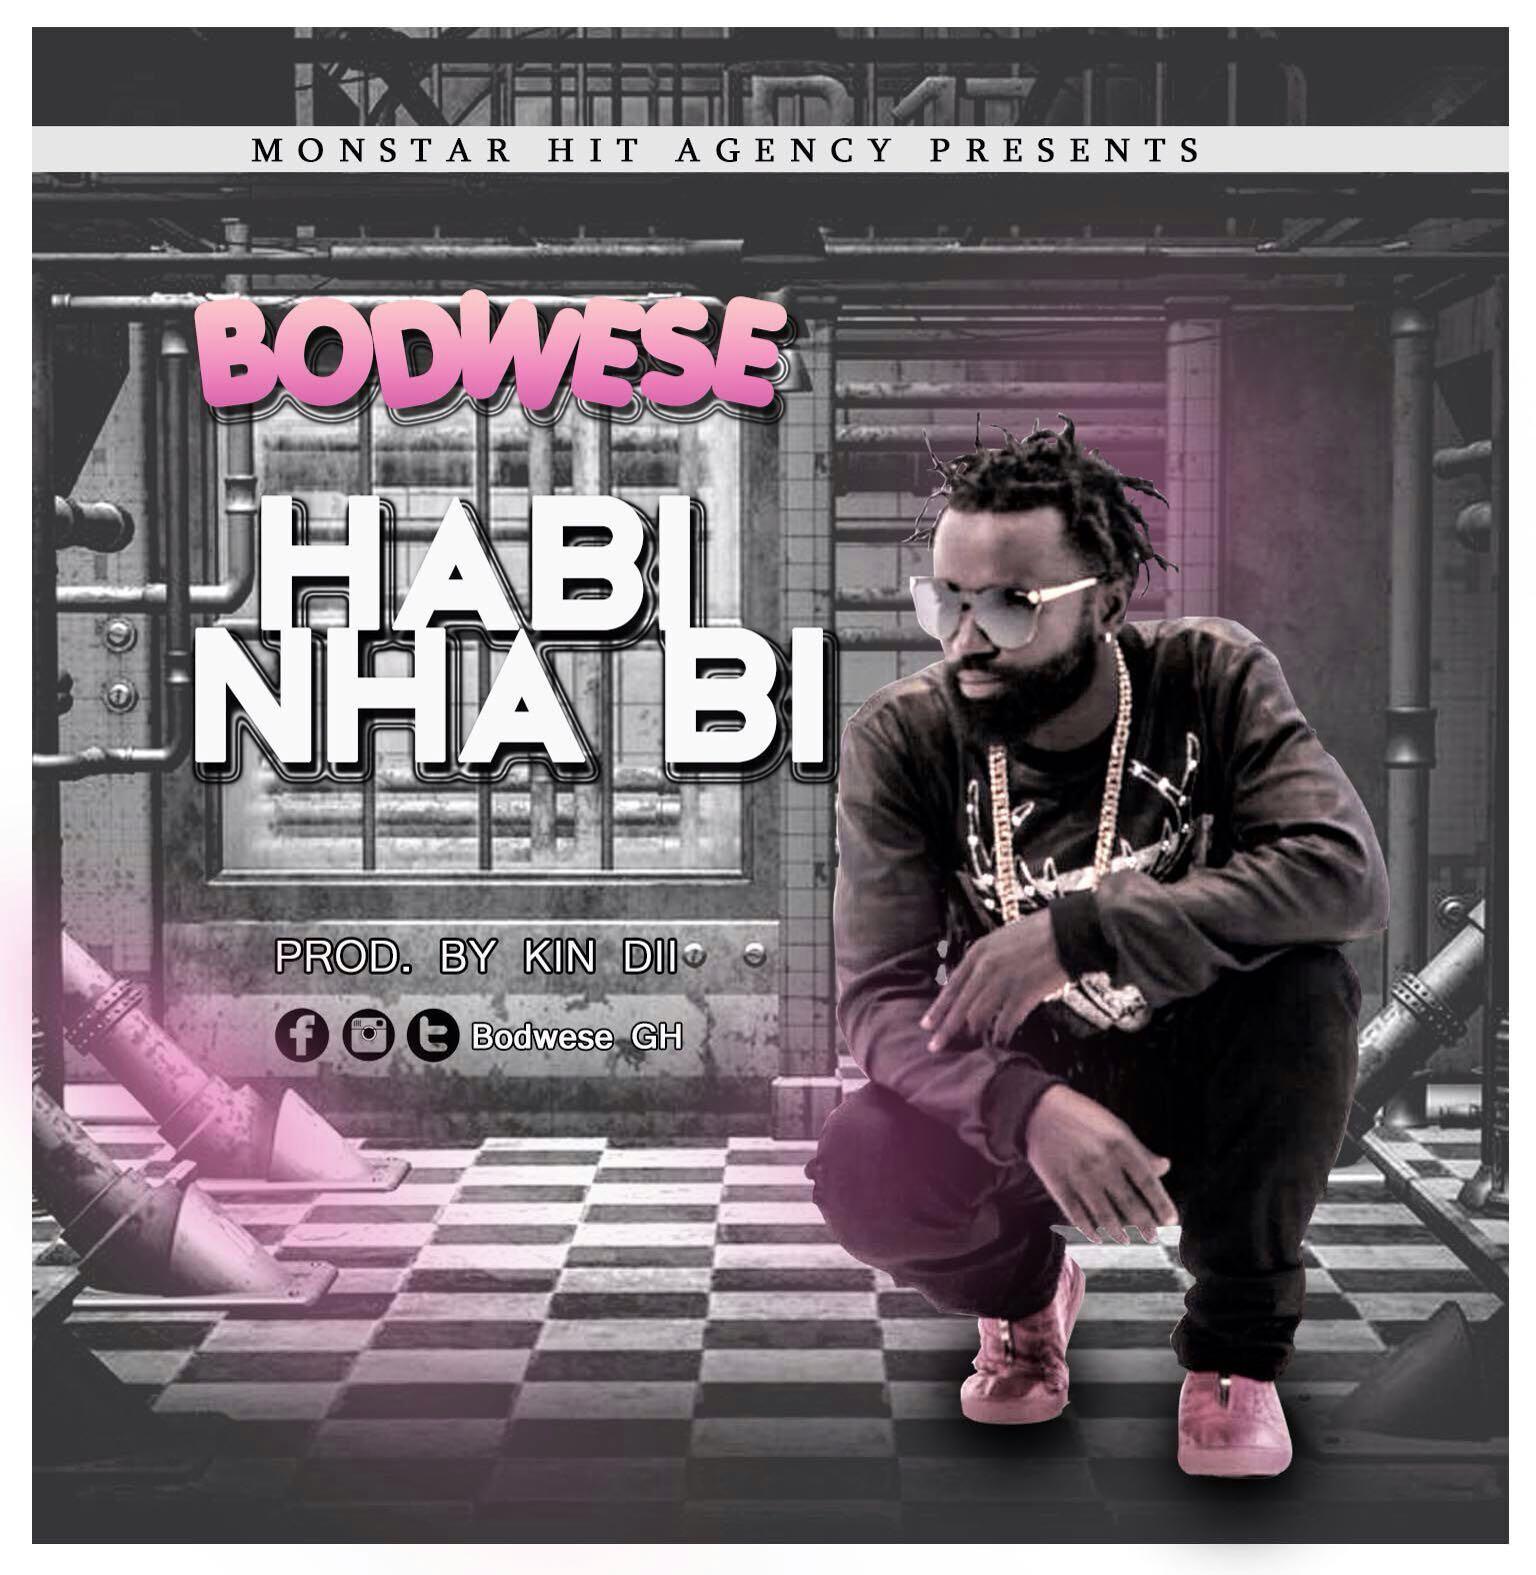 Bodwes Habi Nhabi